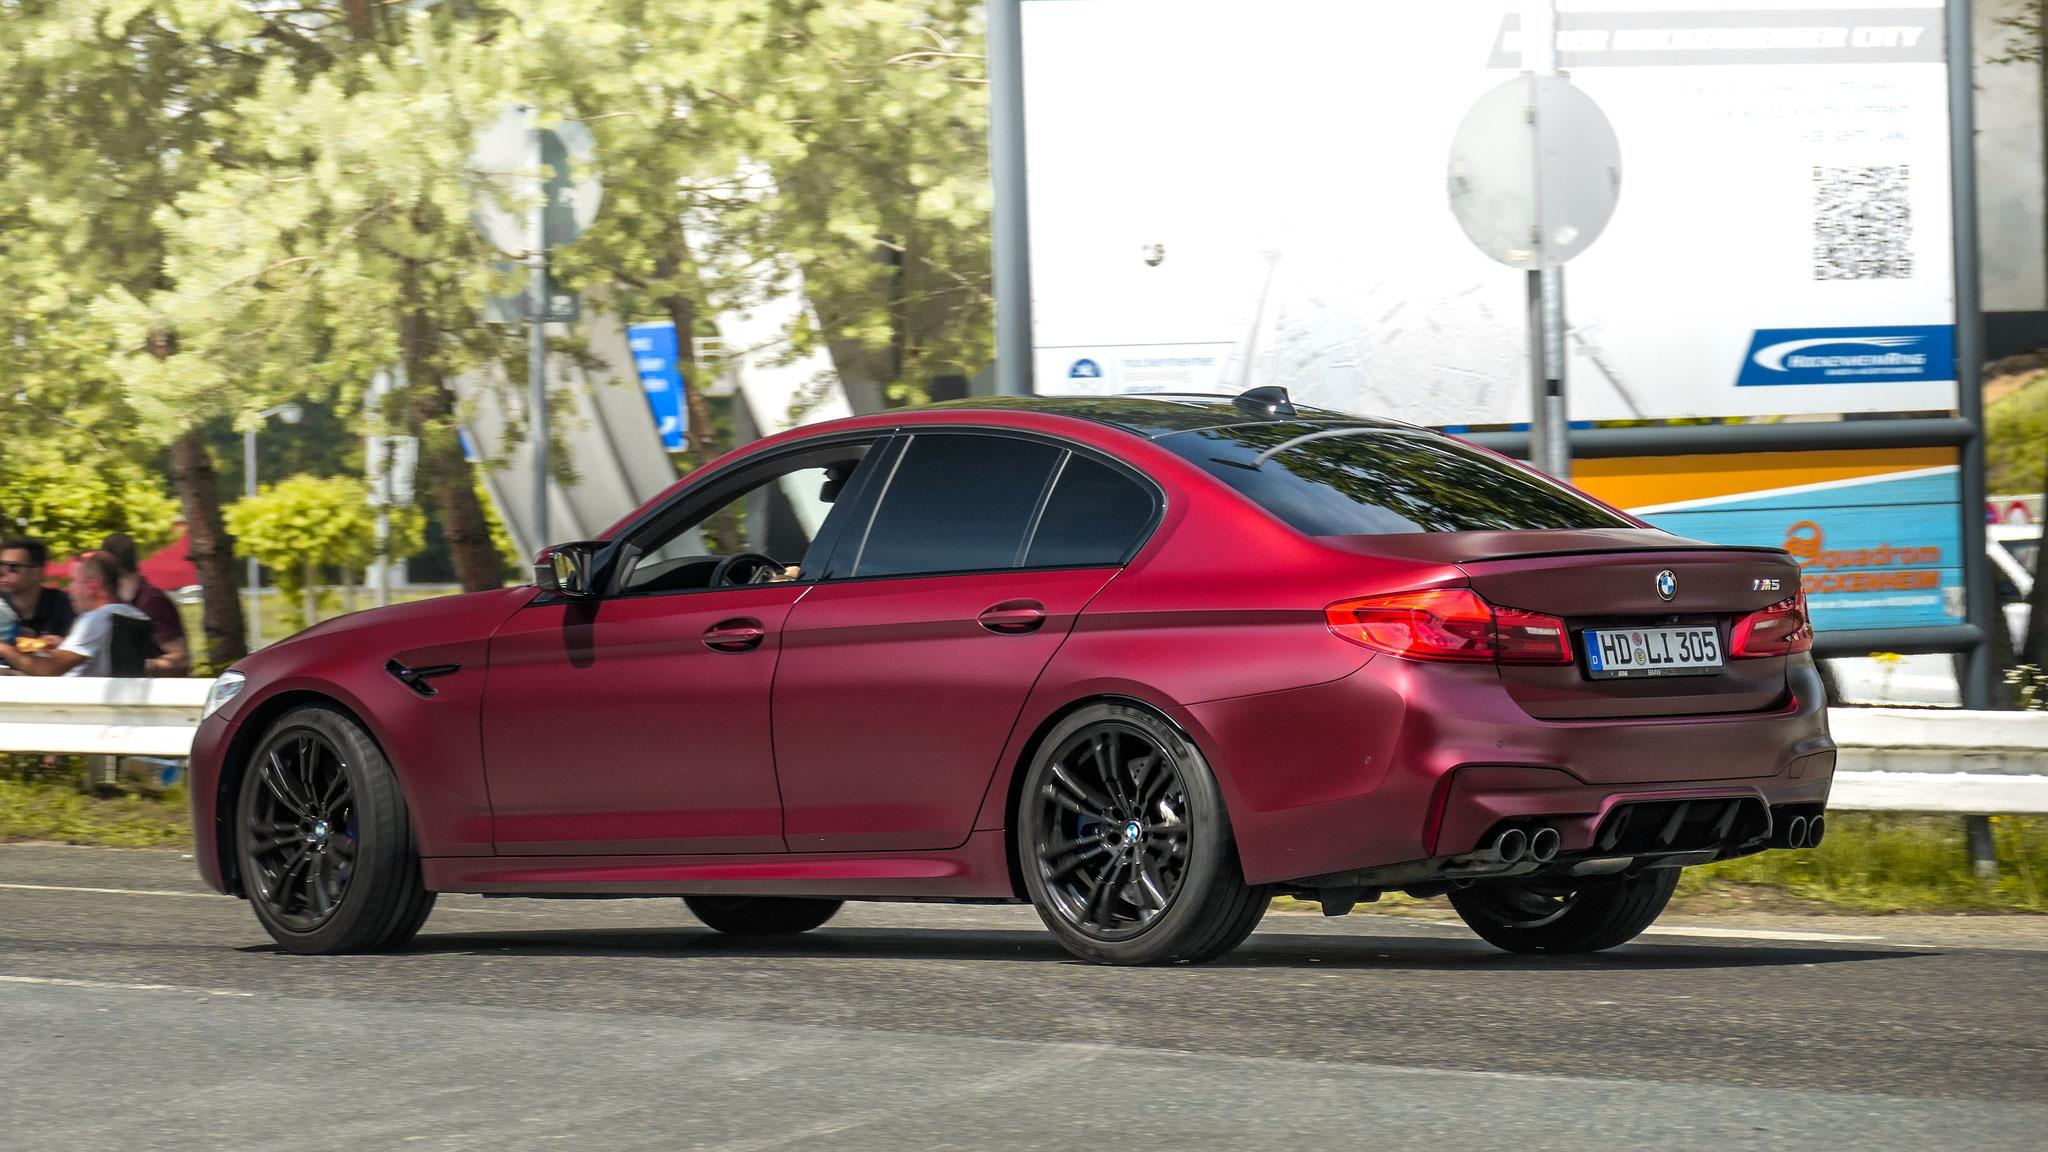 BMW M5 First Edition (1 of 400) - HD-LI-305